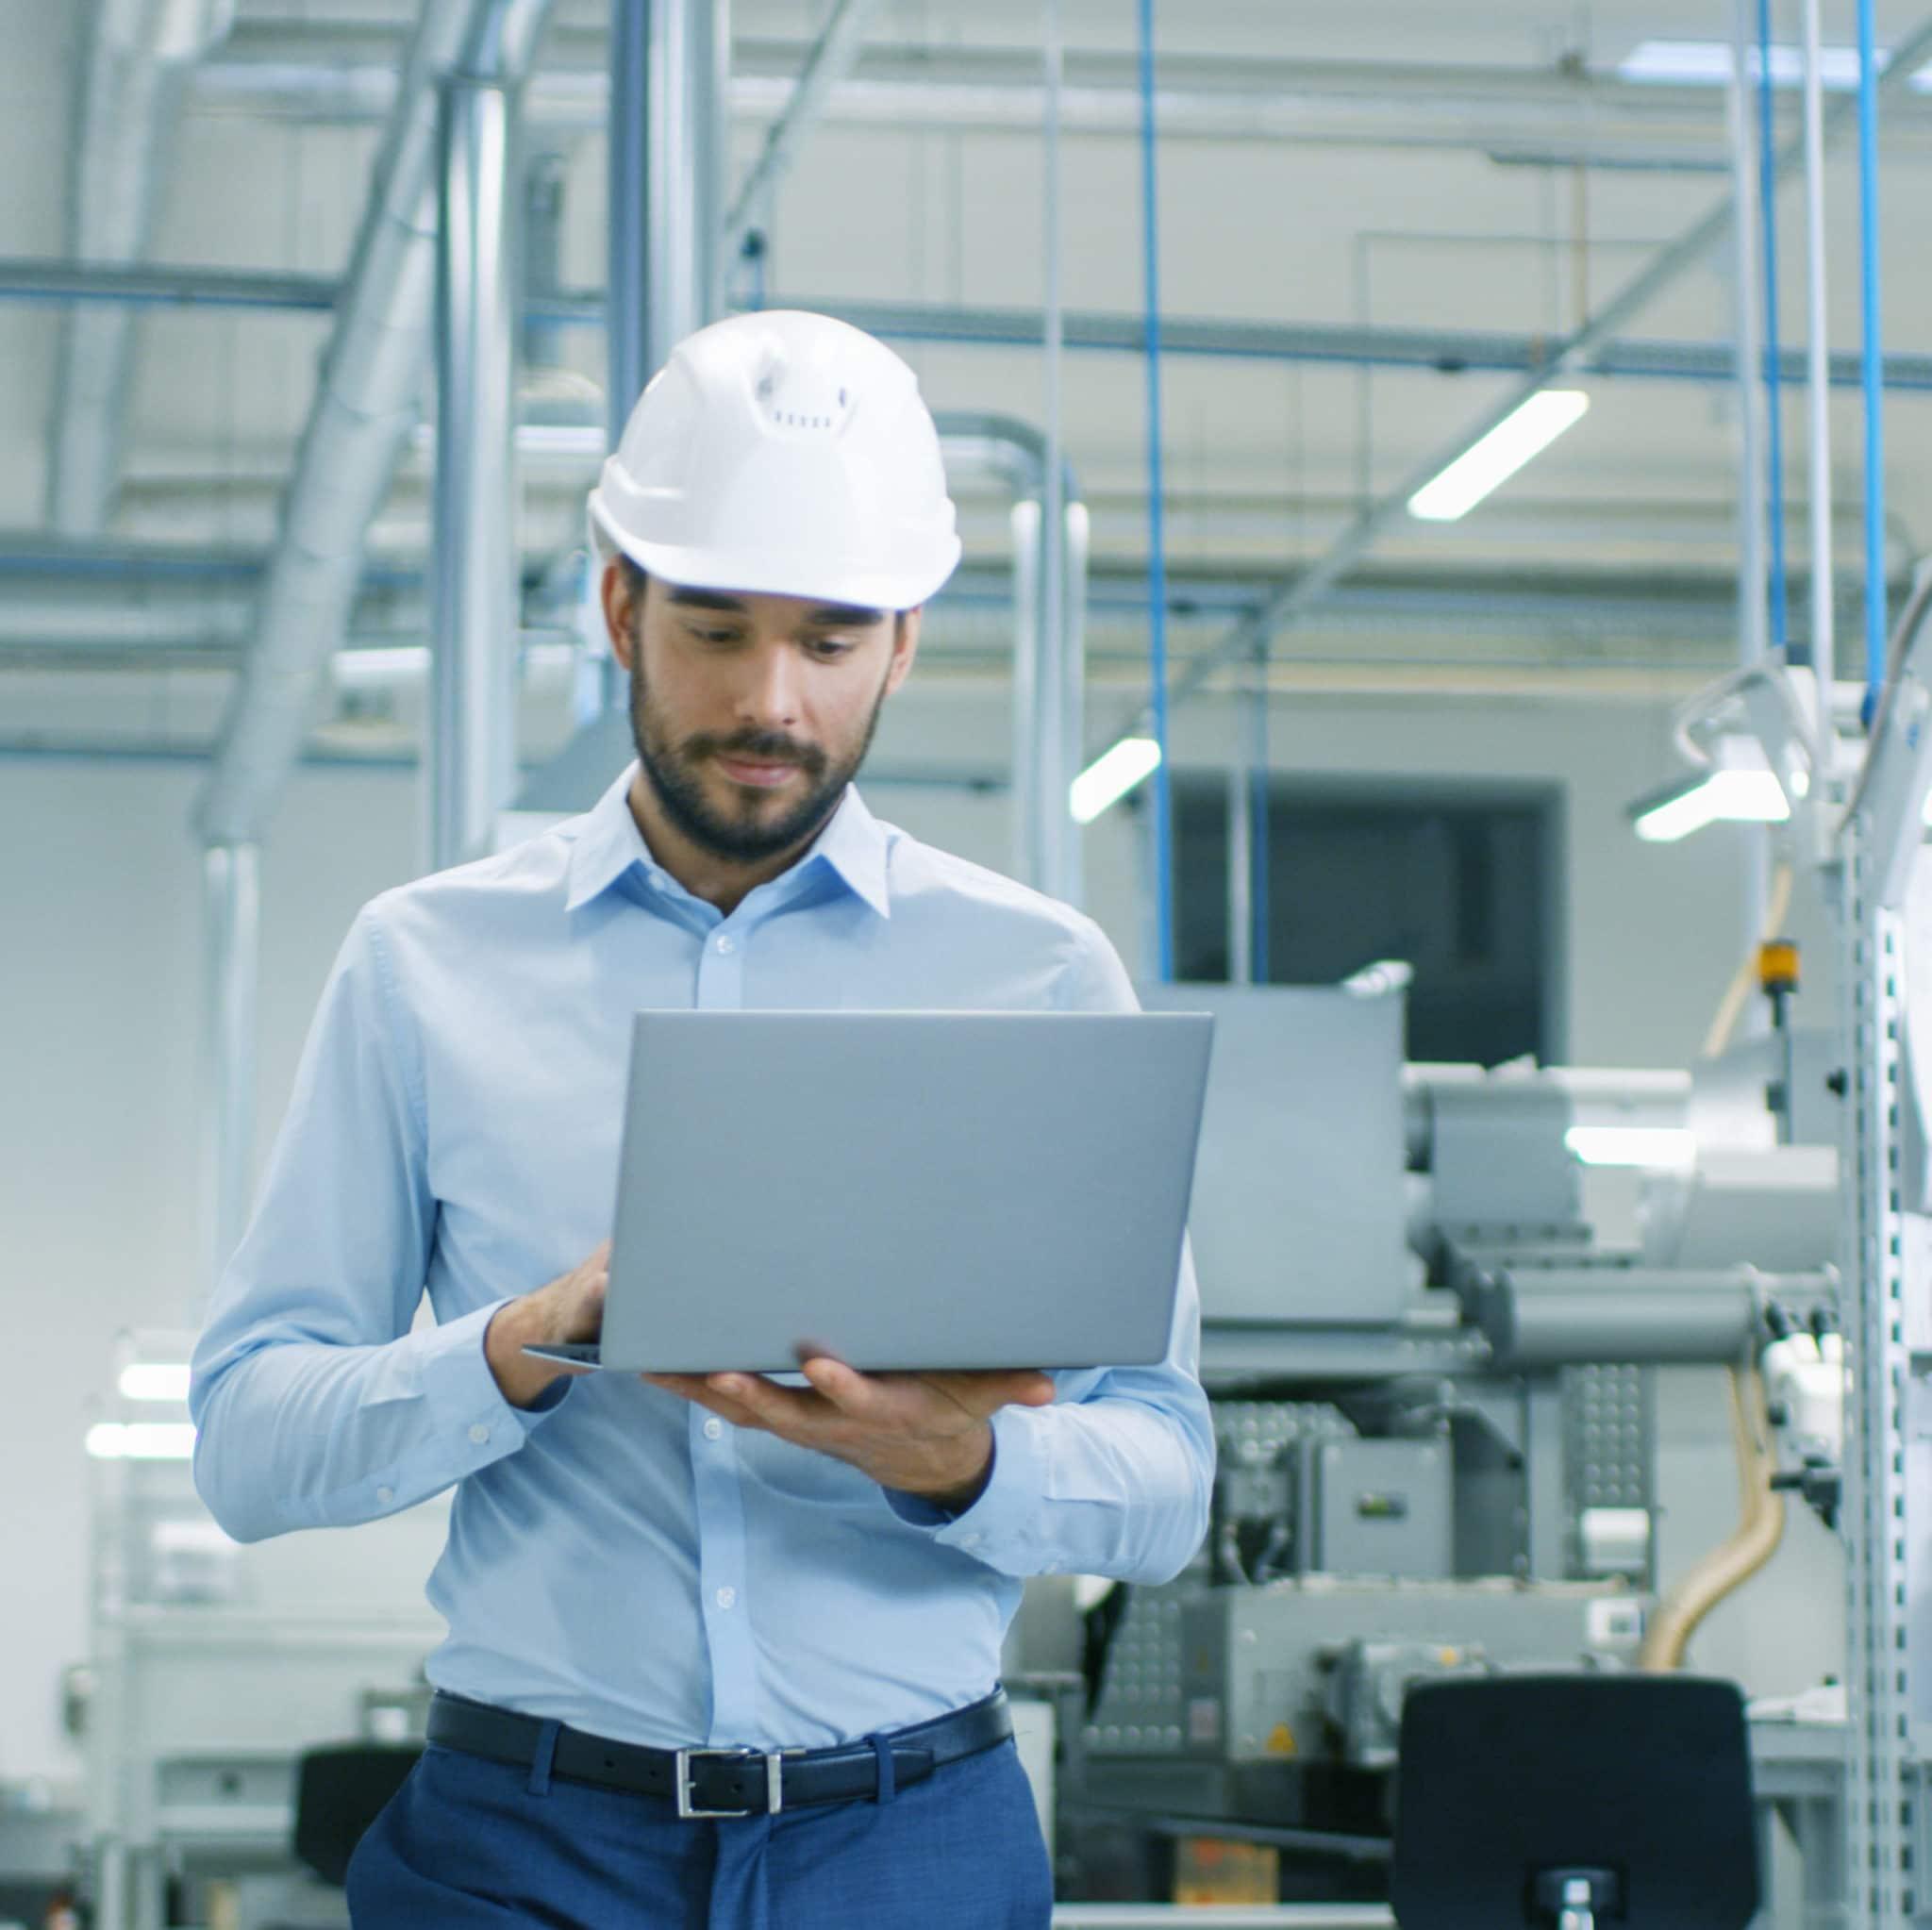 Male engineer wearing hard hat walking with laptop computer.